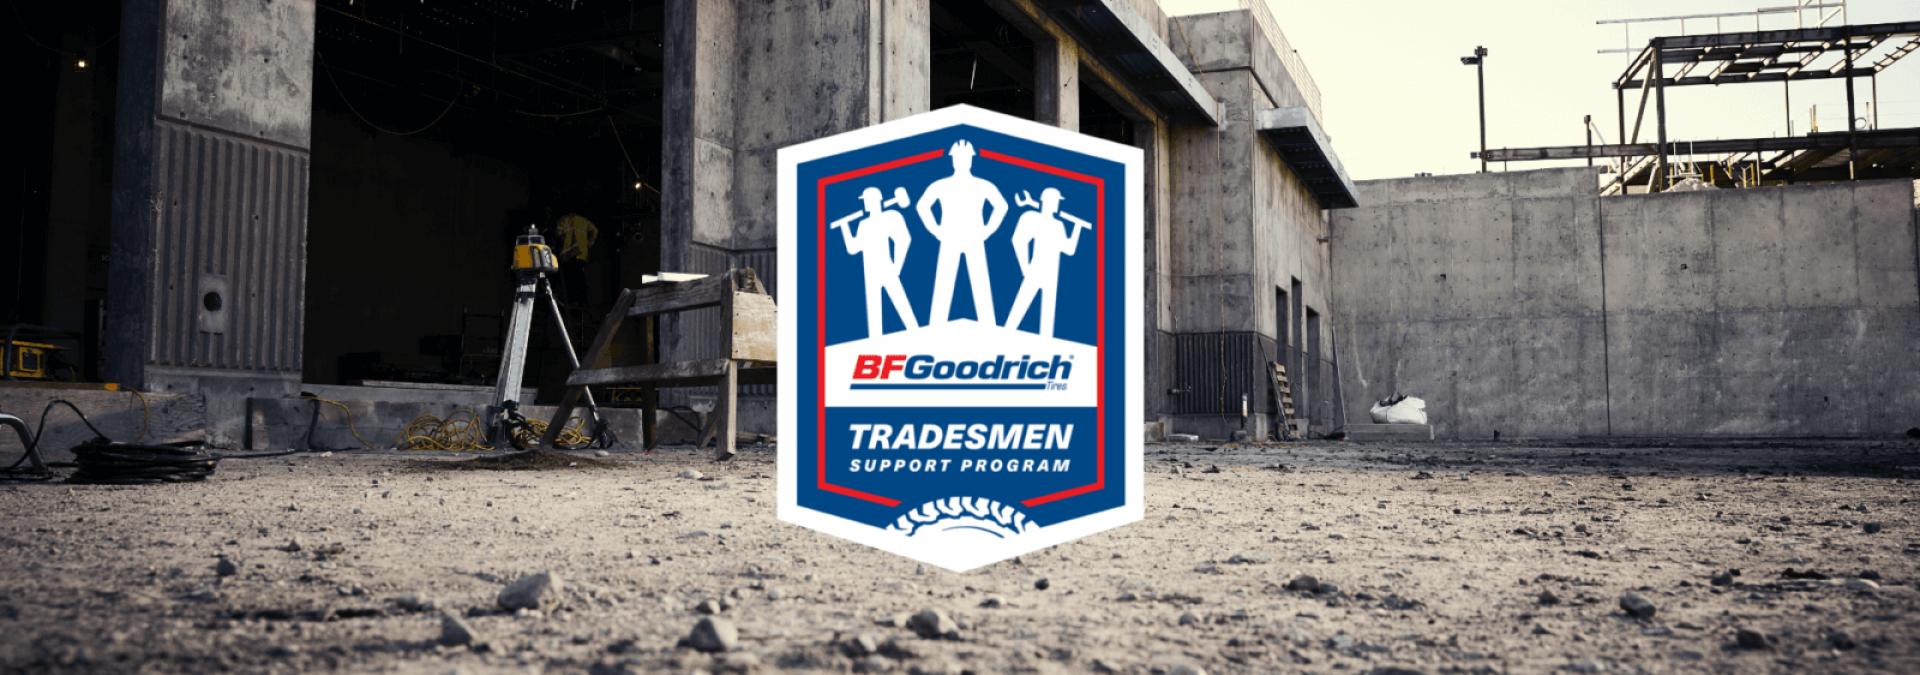 BFGoodrich Tradesmen support program